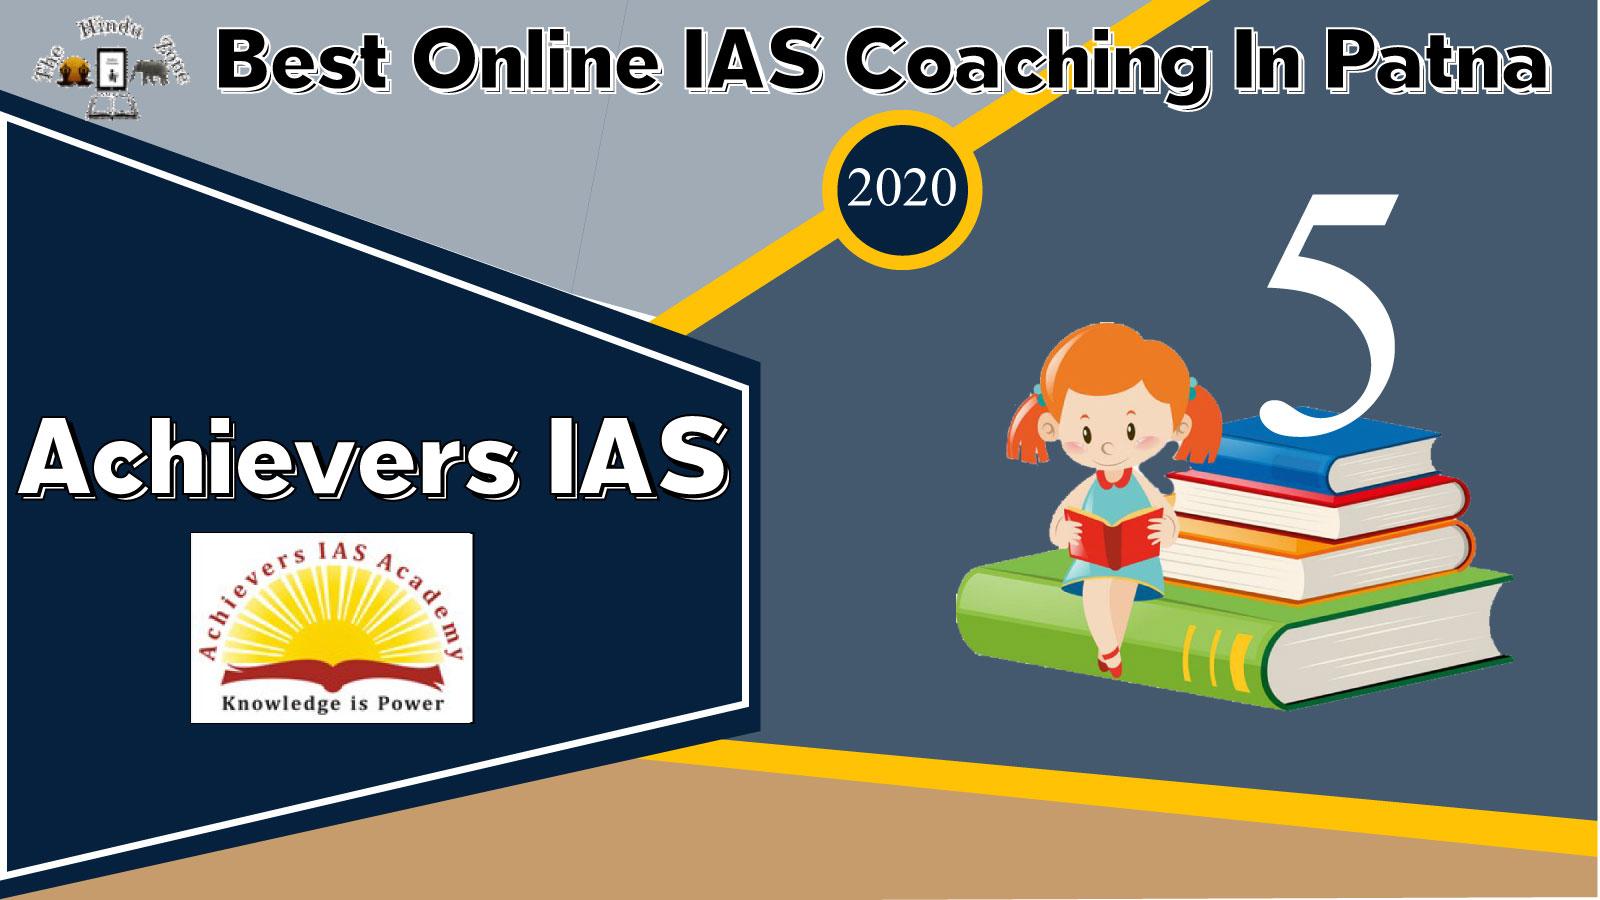 Achievers IAS Online Coaching Institute In Patna